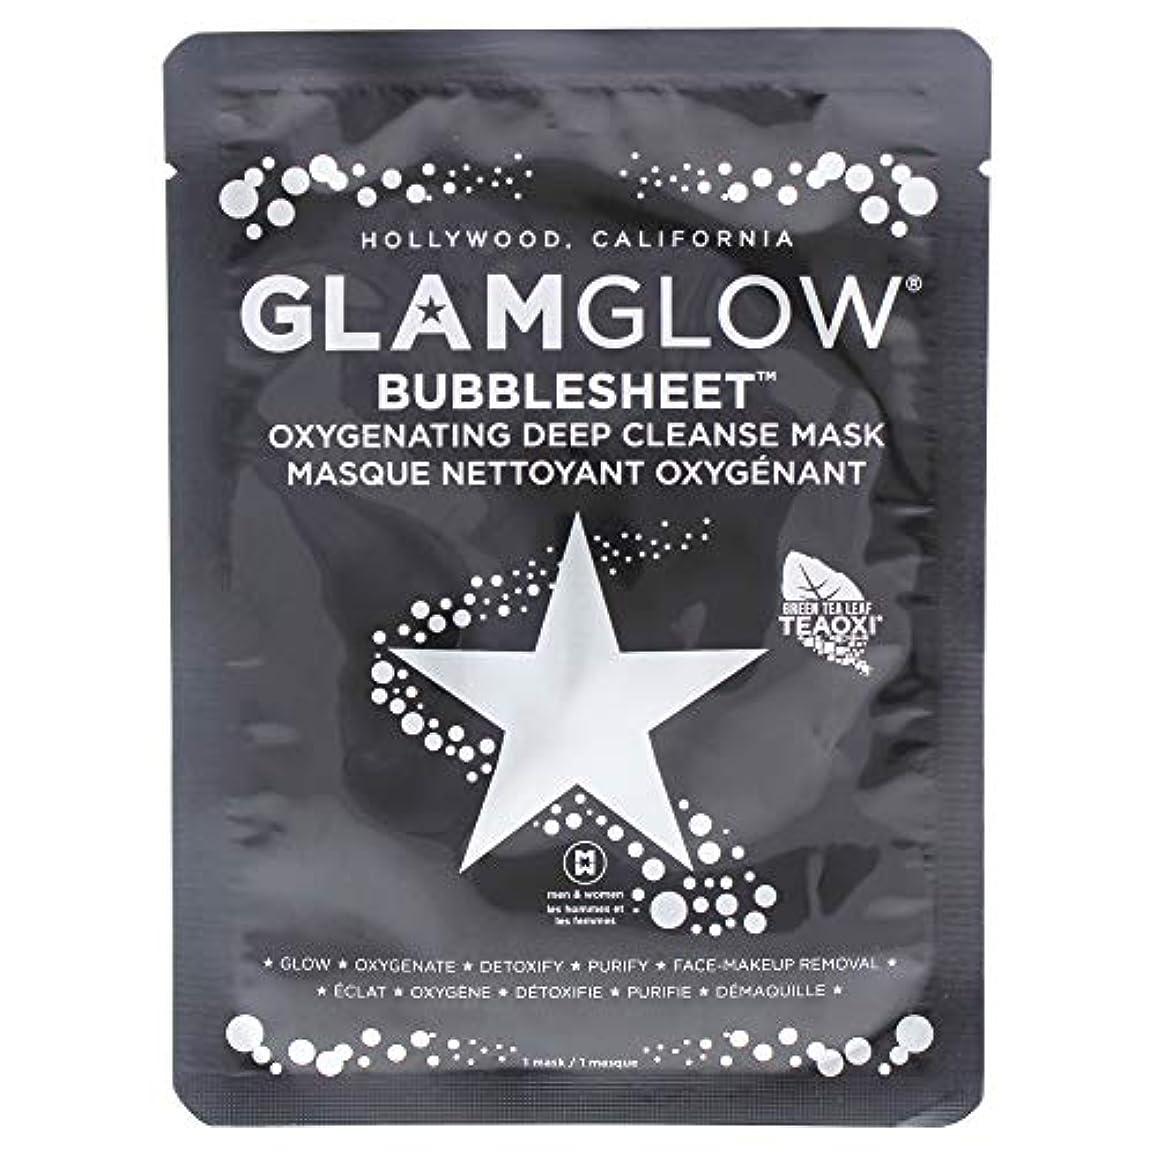 熱狂的な弁護小売Glam Glow Bubblesheet Oxygenating Deep Cleanse Mask